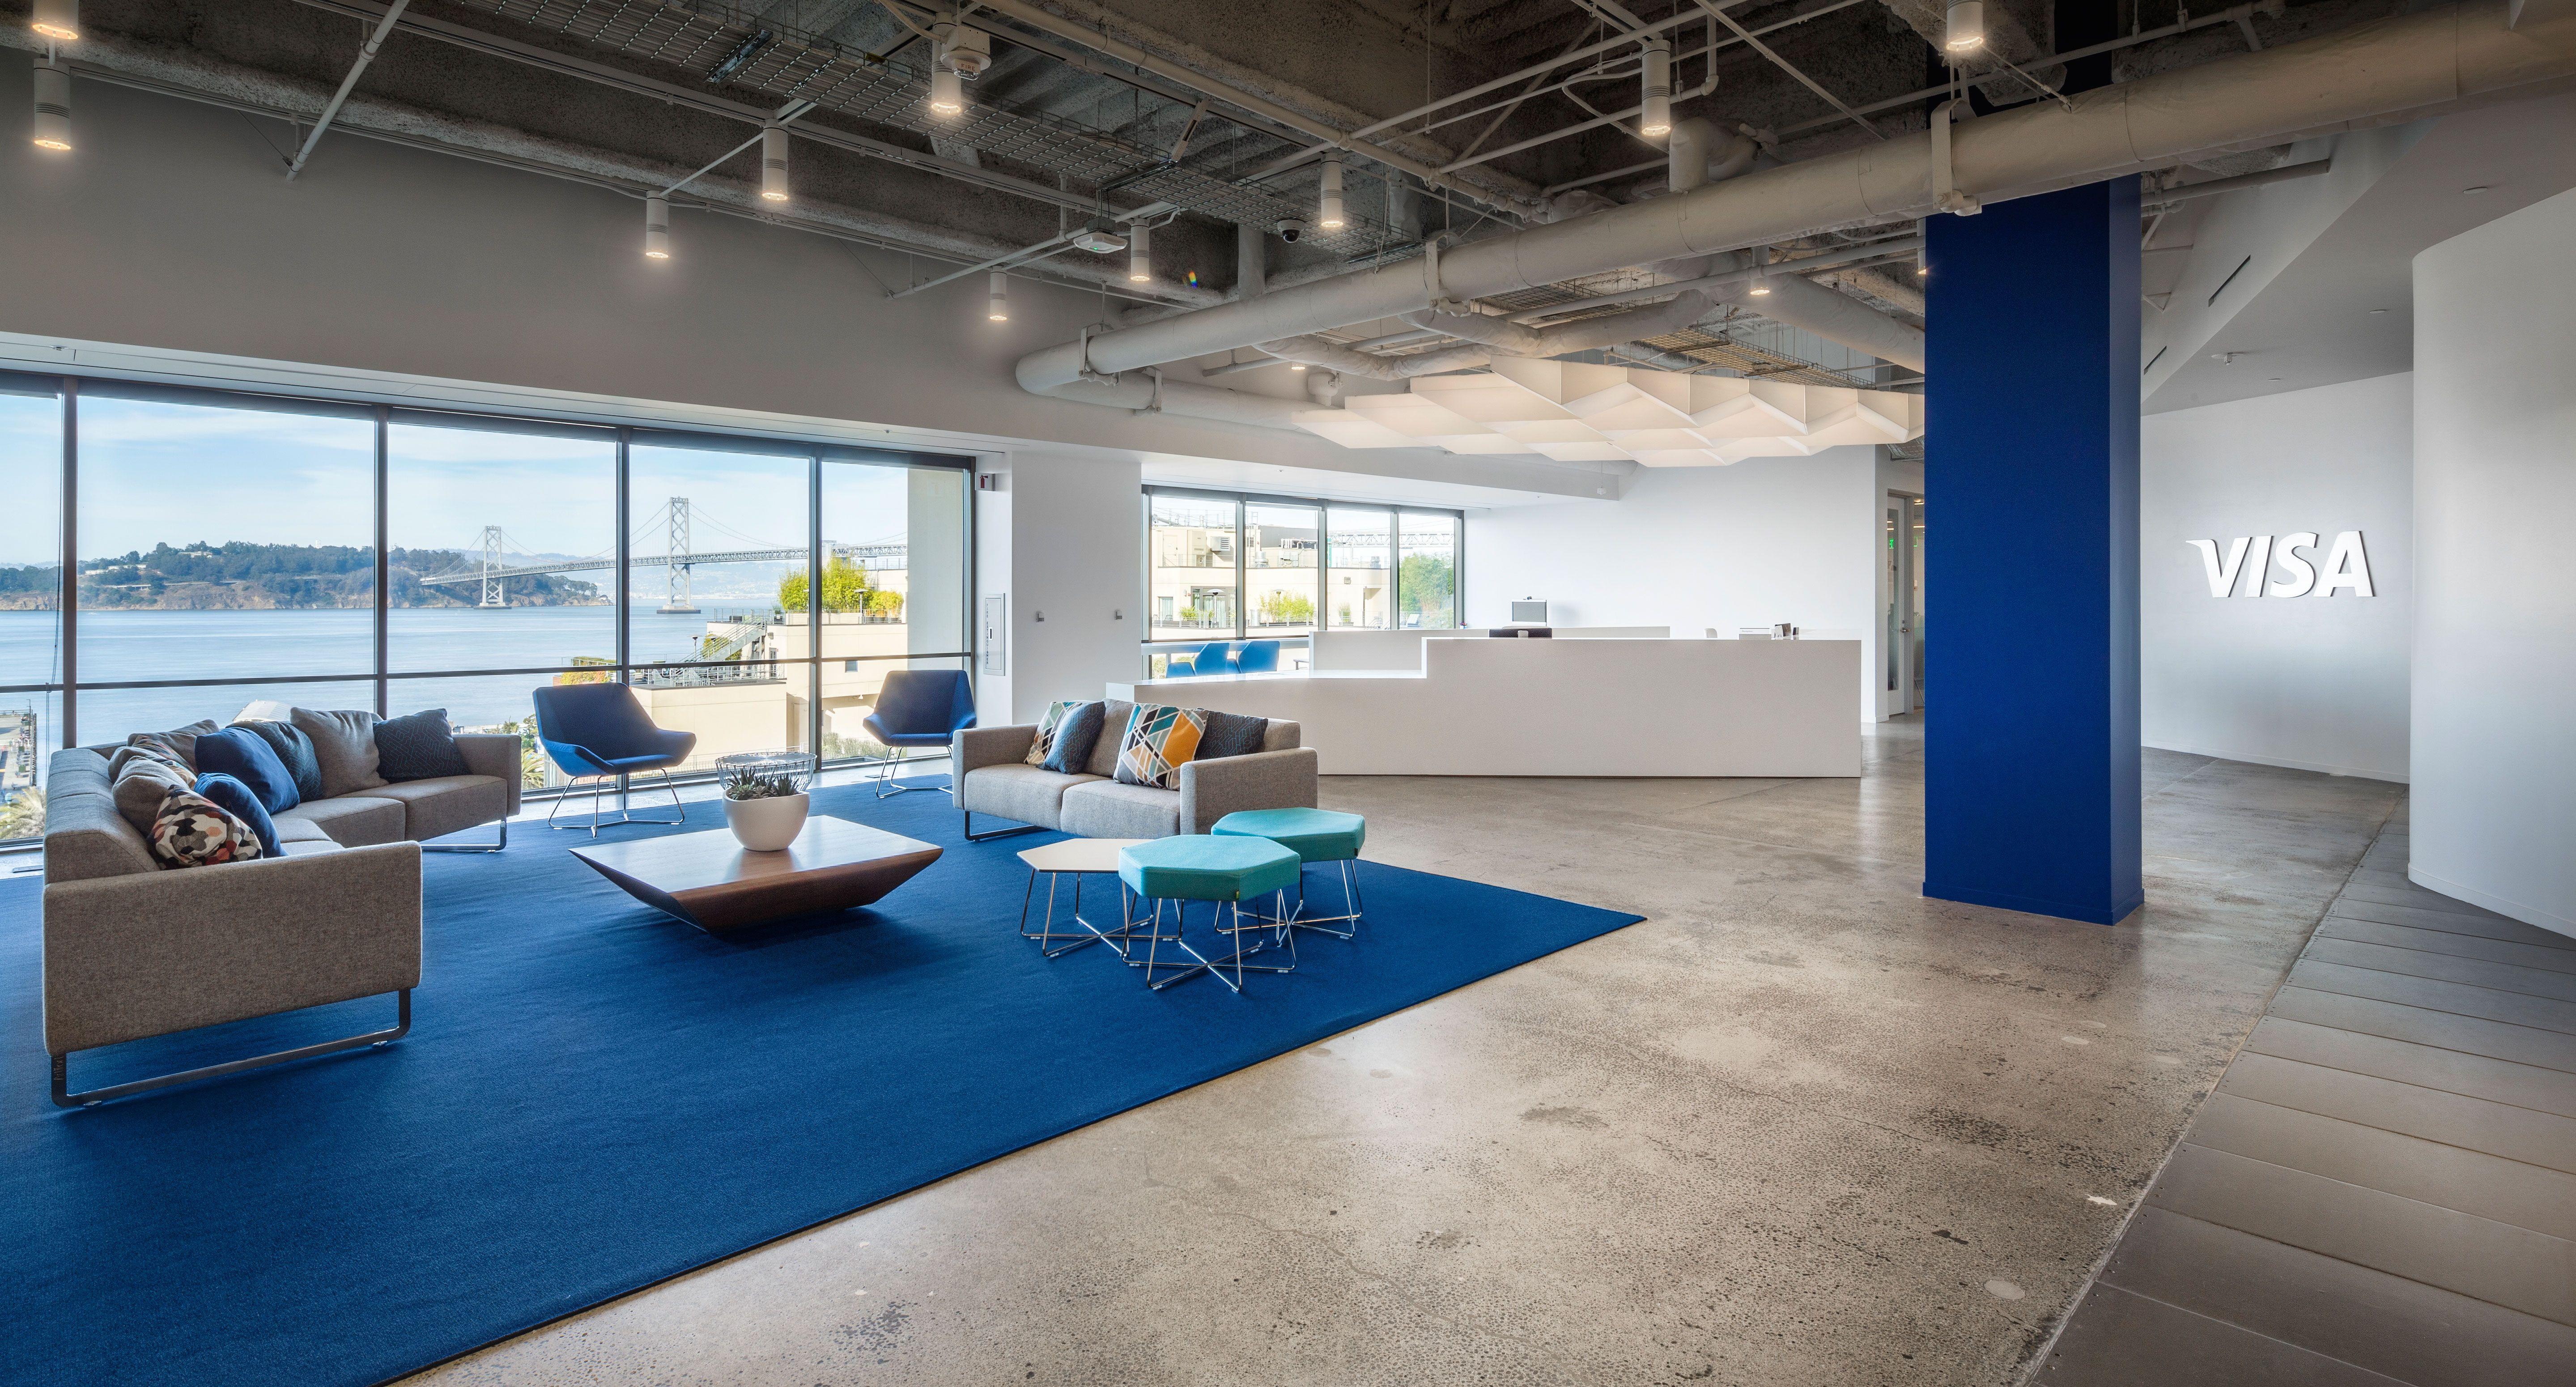 Visa - San Francisco Office | Design Resources - Spaces ...